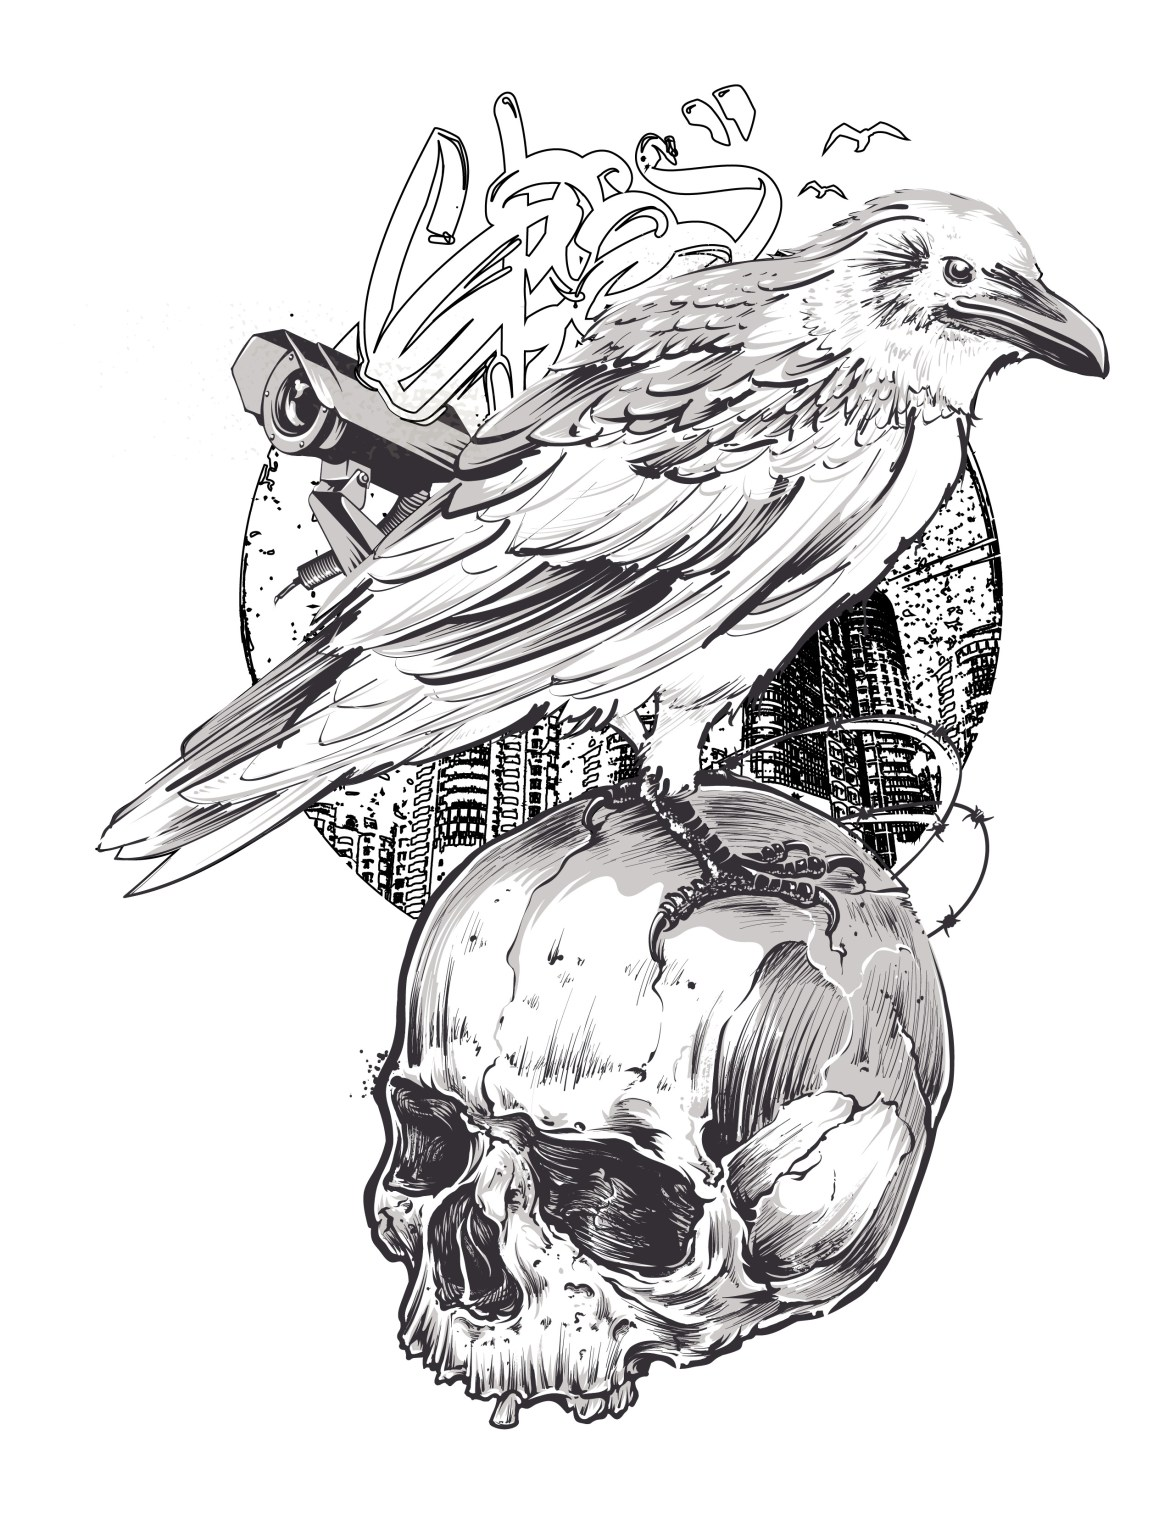 Halloween dessin pour coloriage adulte grayscale